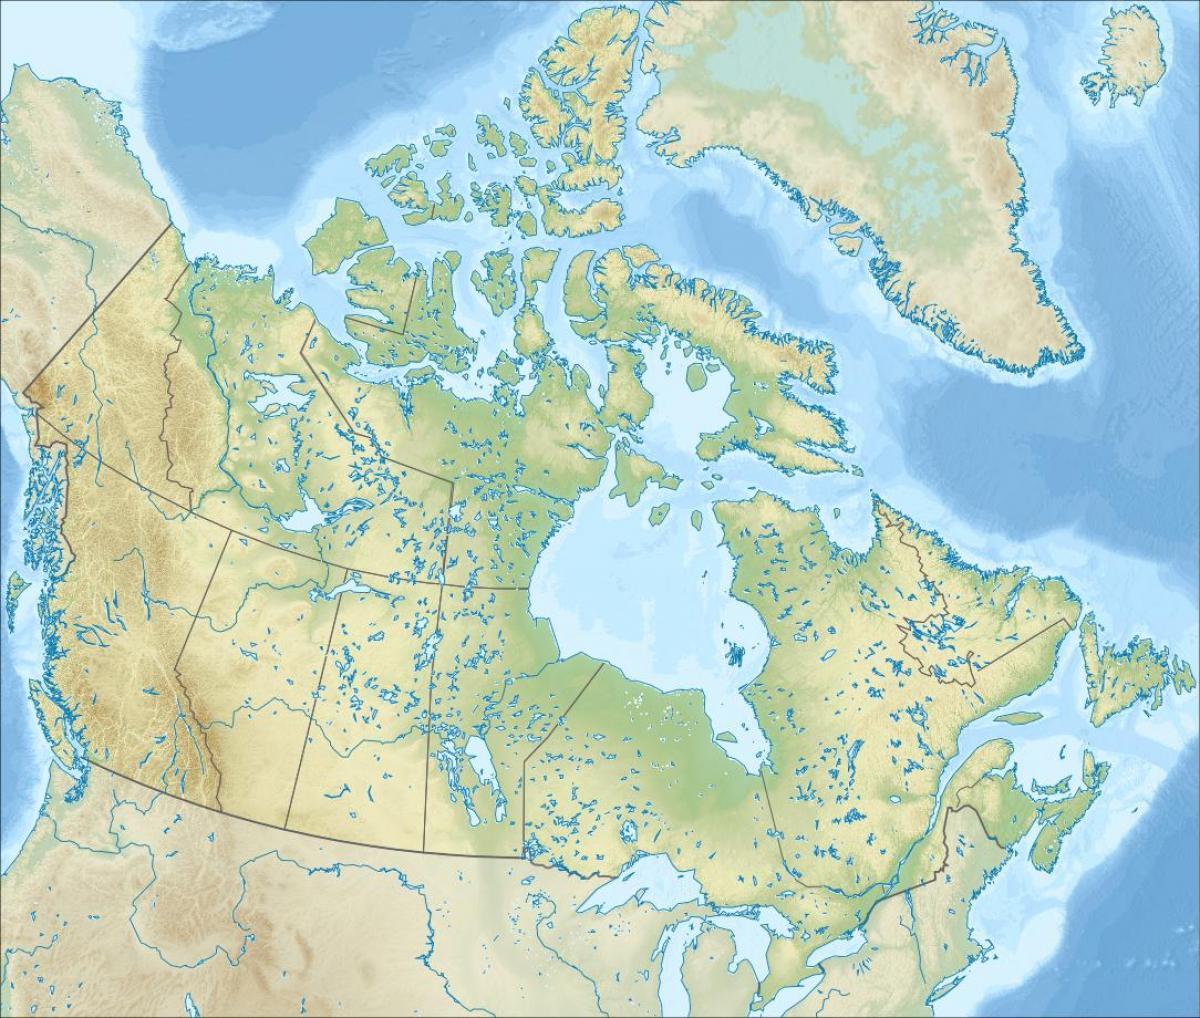 Domborzati Terkep Kanada Terkep Kanada Dombormu Eszak Amerika